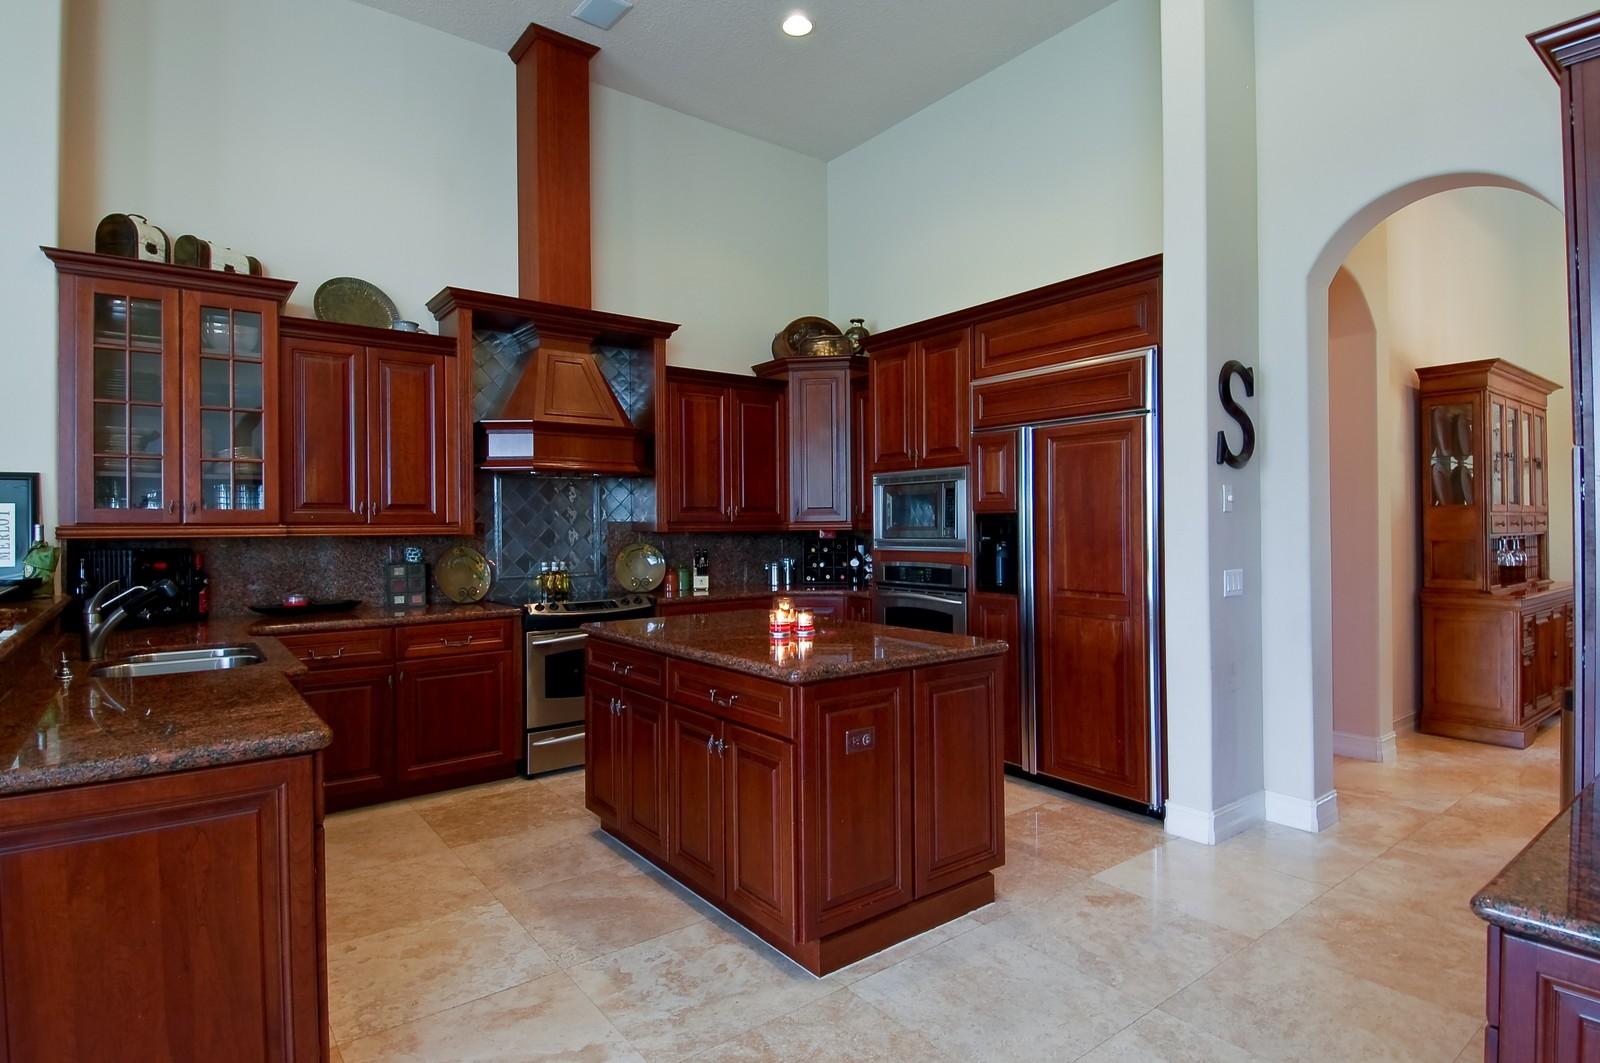 Real Estate Photography - 11687 NW 69th Pl, Parkland, FL, 33076 - acevedokitchne.jpeg